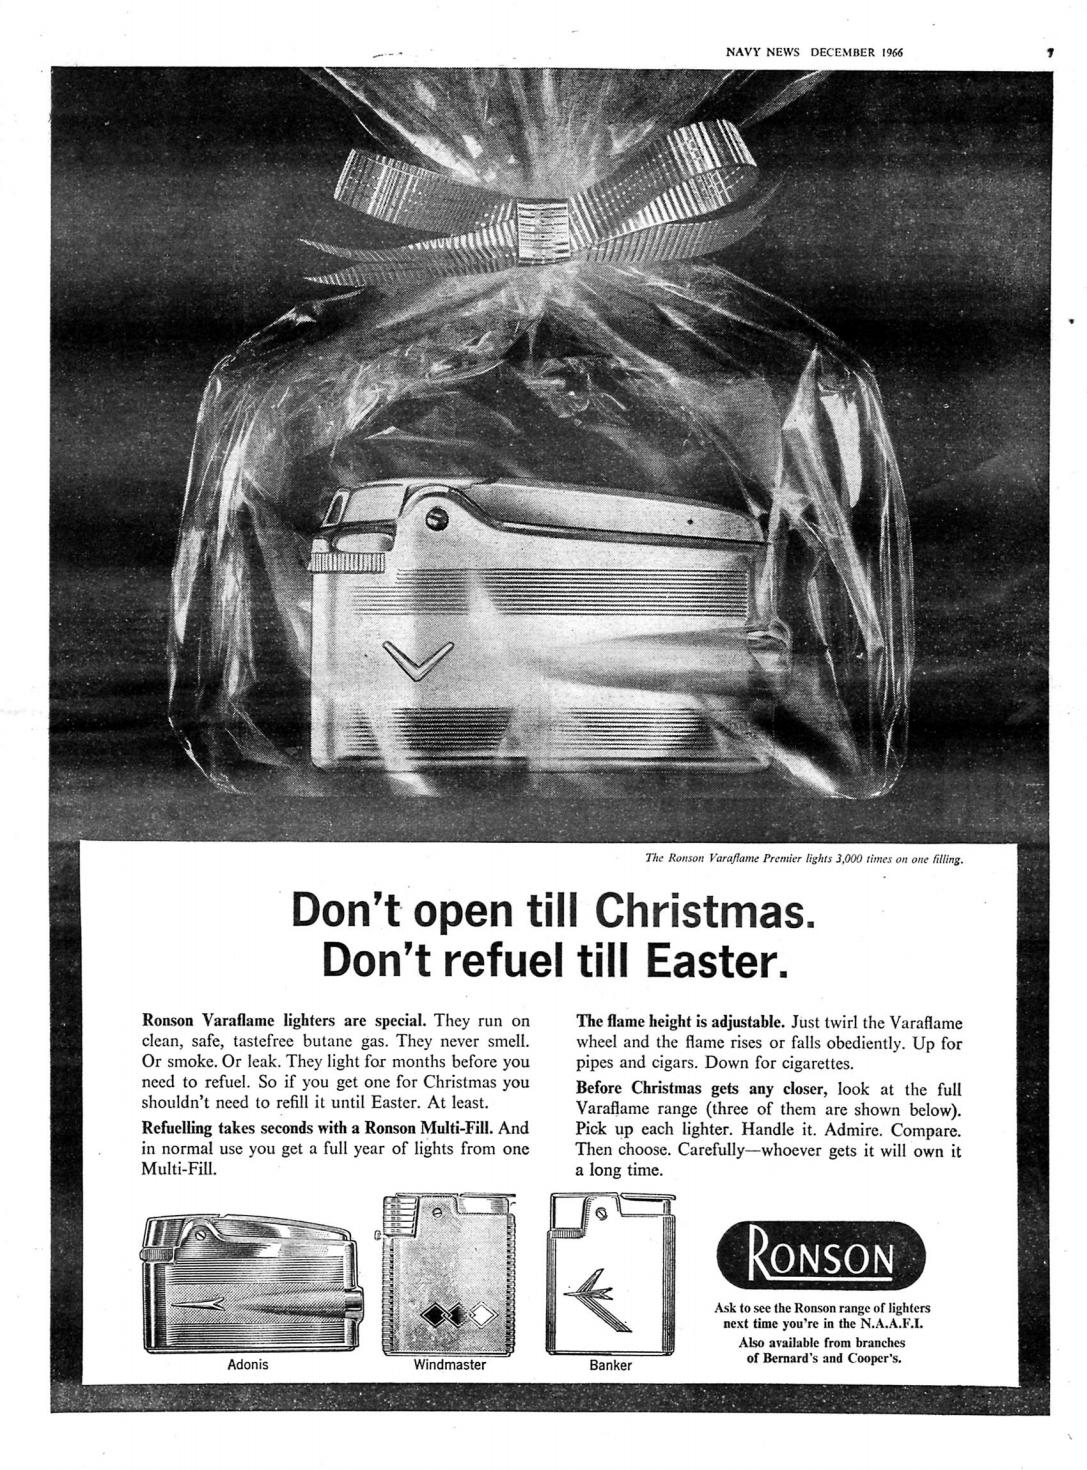 196612 by Navy News - issuu